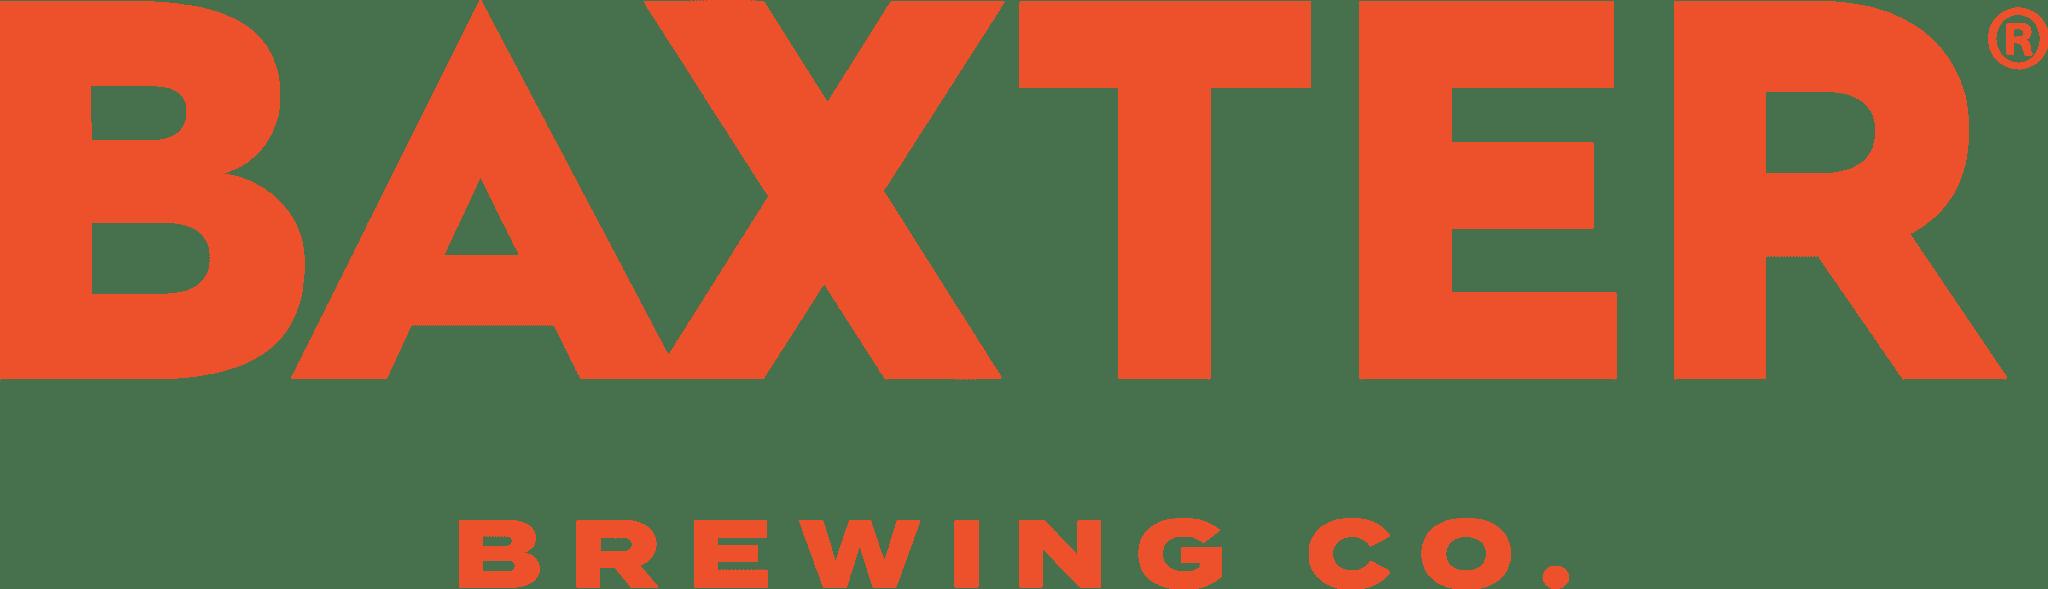 Baxter Brewing Co.